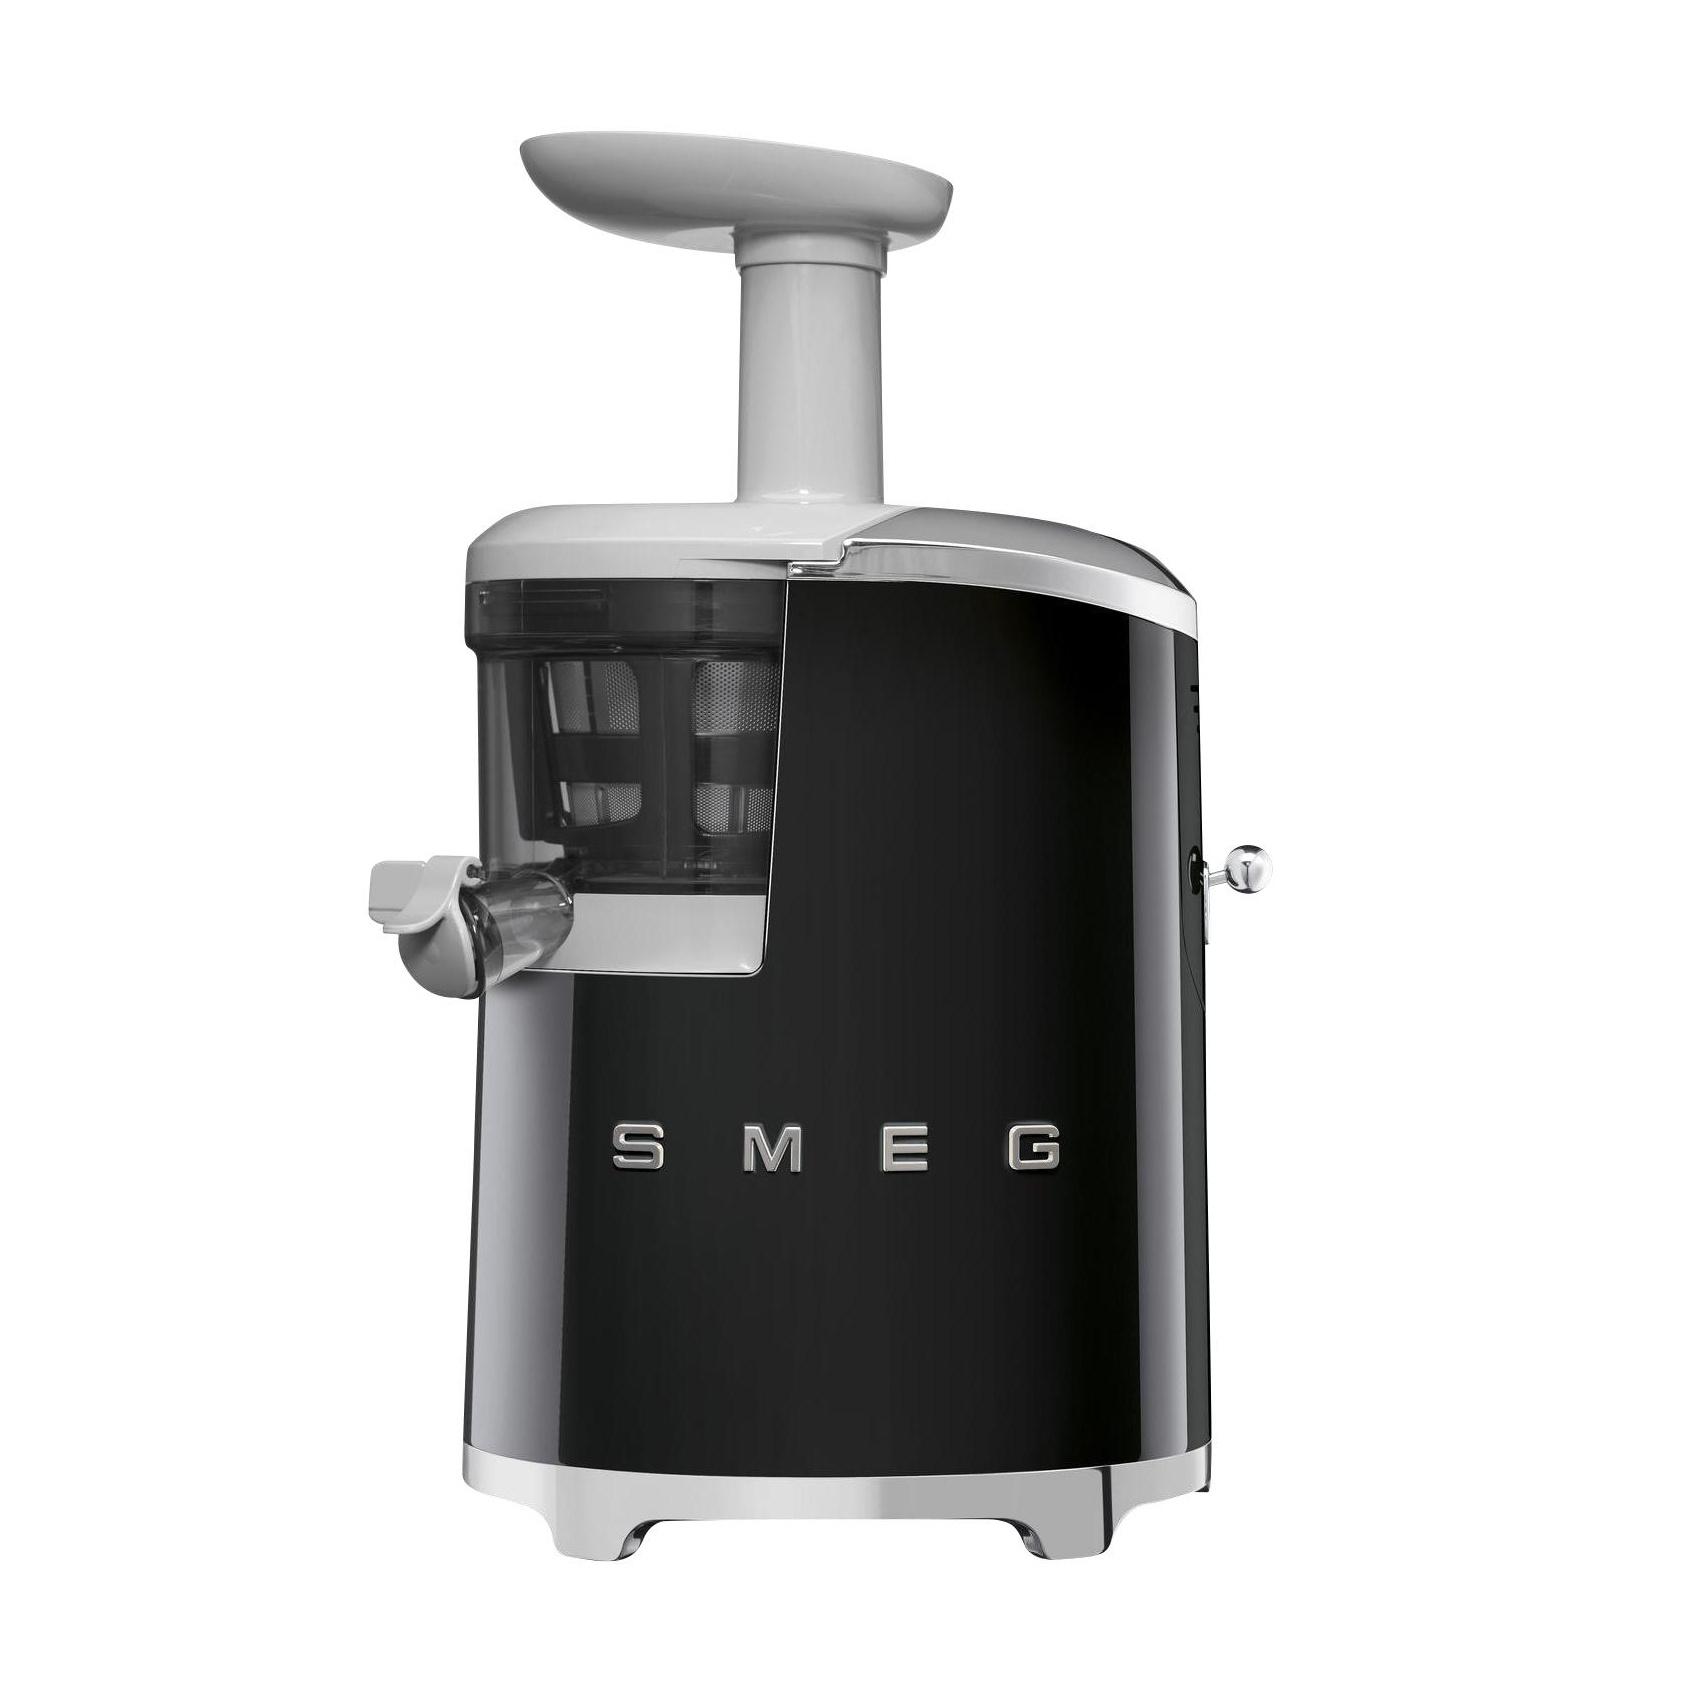 Smeg - SJF01 Slow Juicer Entsafter - schwarz/lackiert/BxHxT 27x42x17cm/mit Rezeptbuch | Küche und Esszimmer > Küchengeräte > Entsafter | Smeg